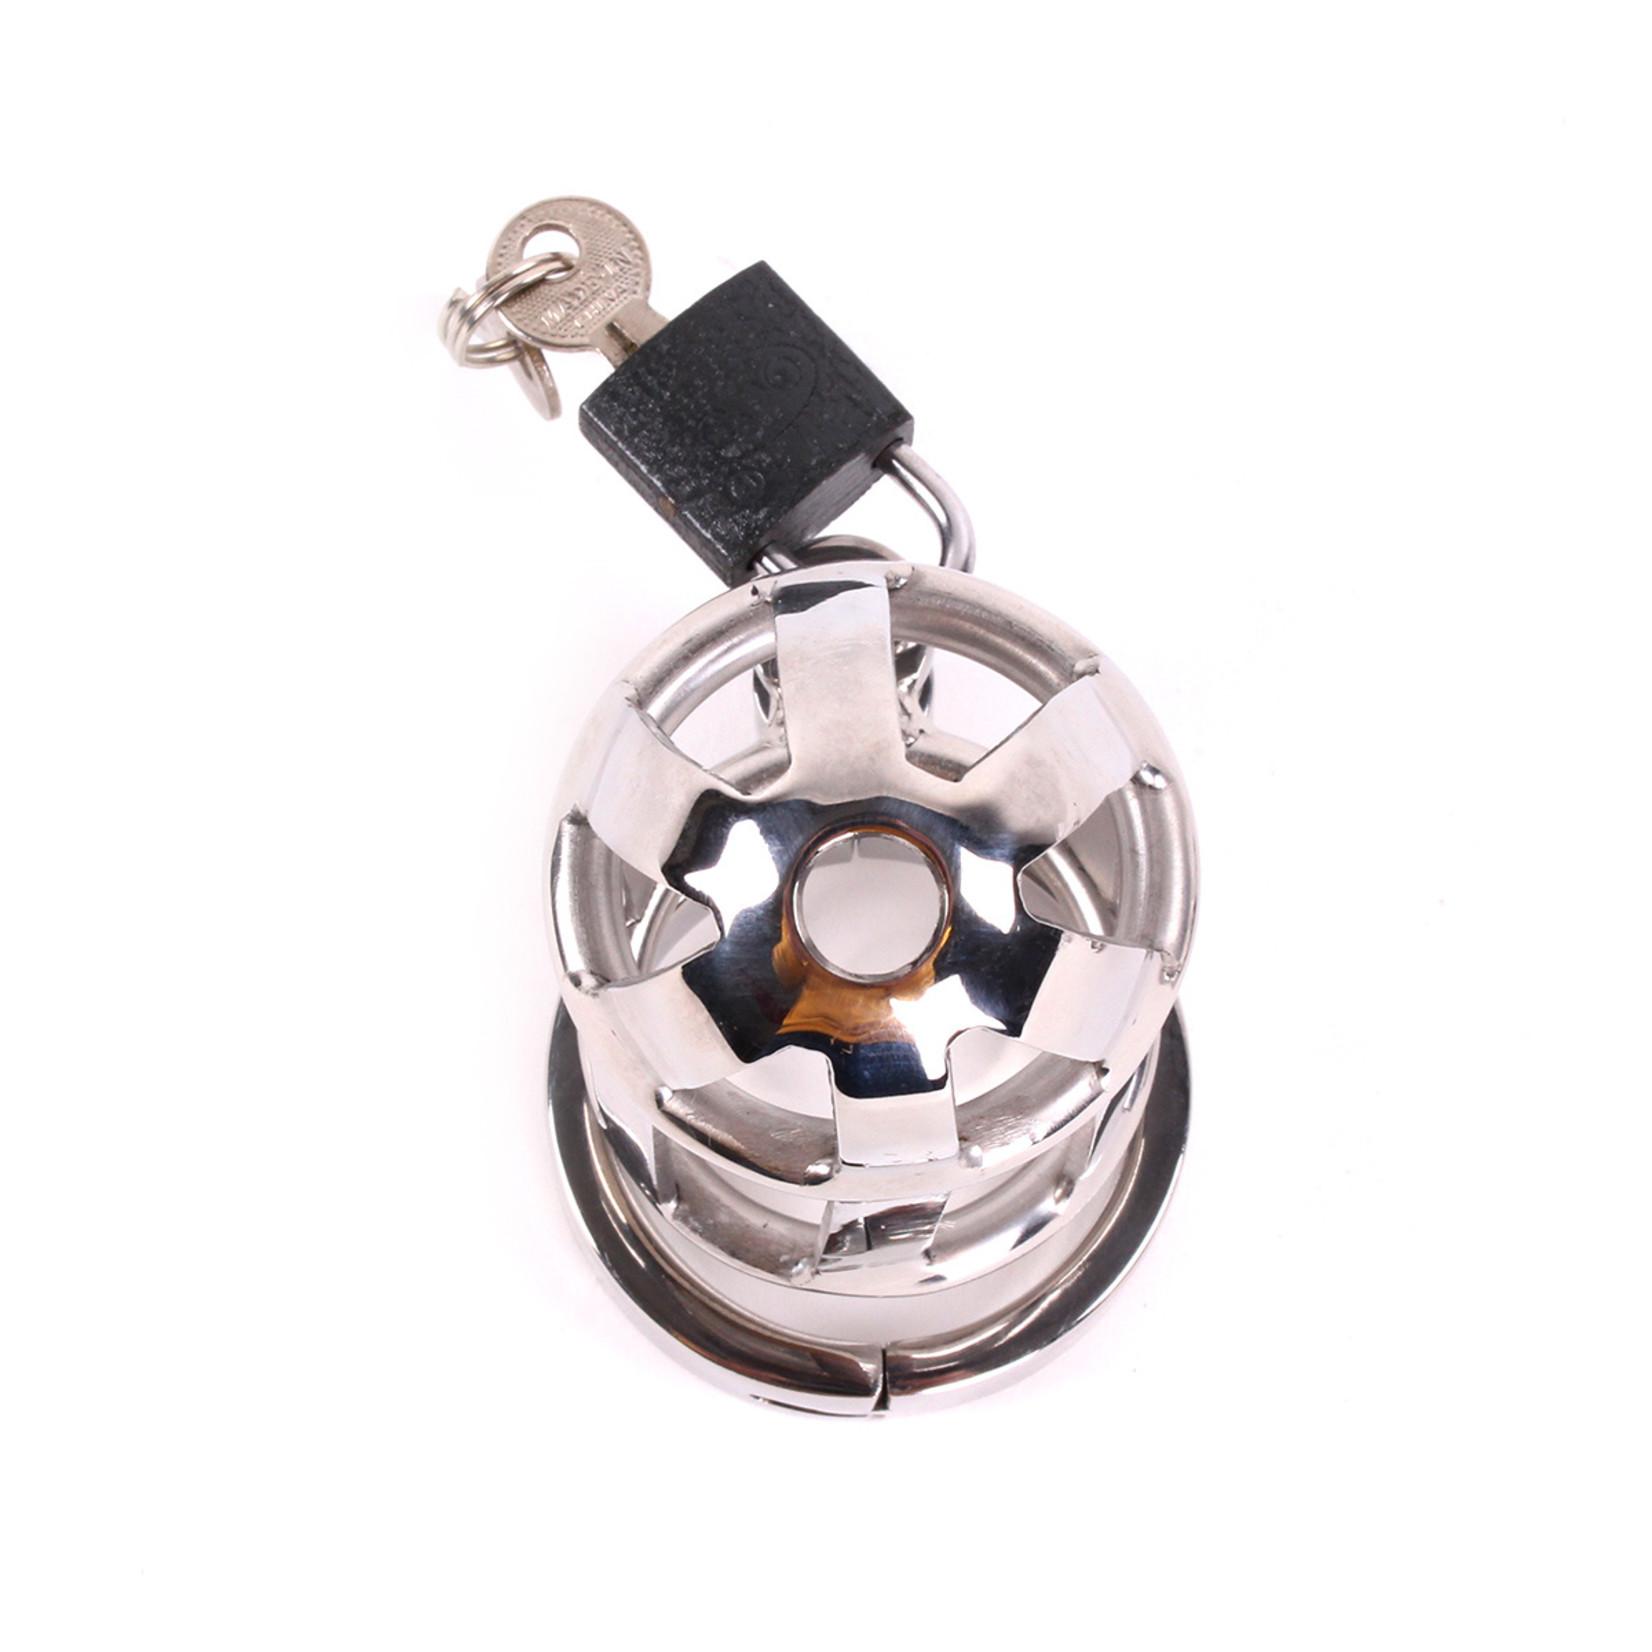 KIOTOS Steel Chastity Cage DeLuxe 8 cm